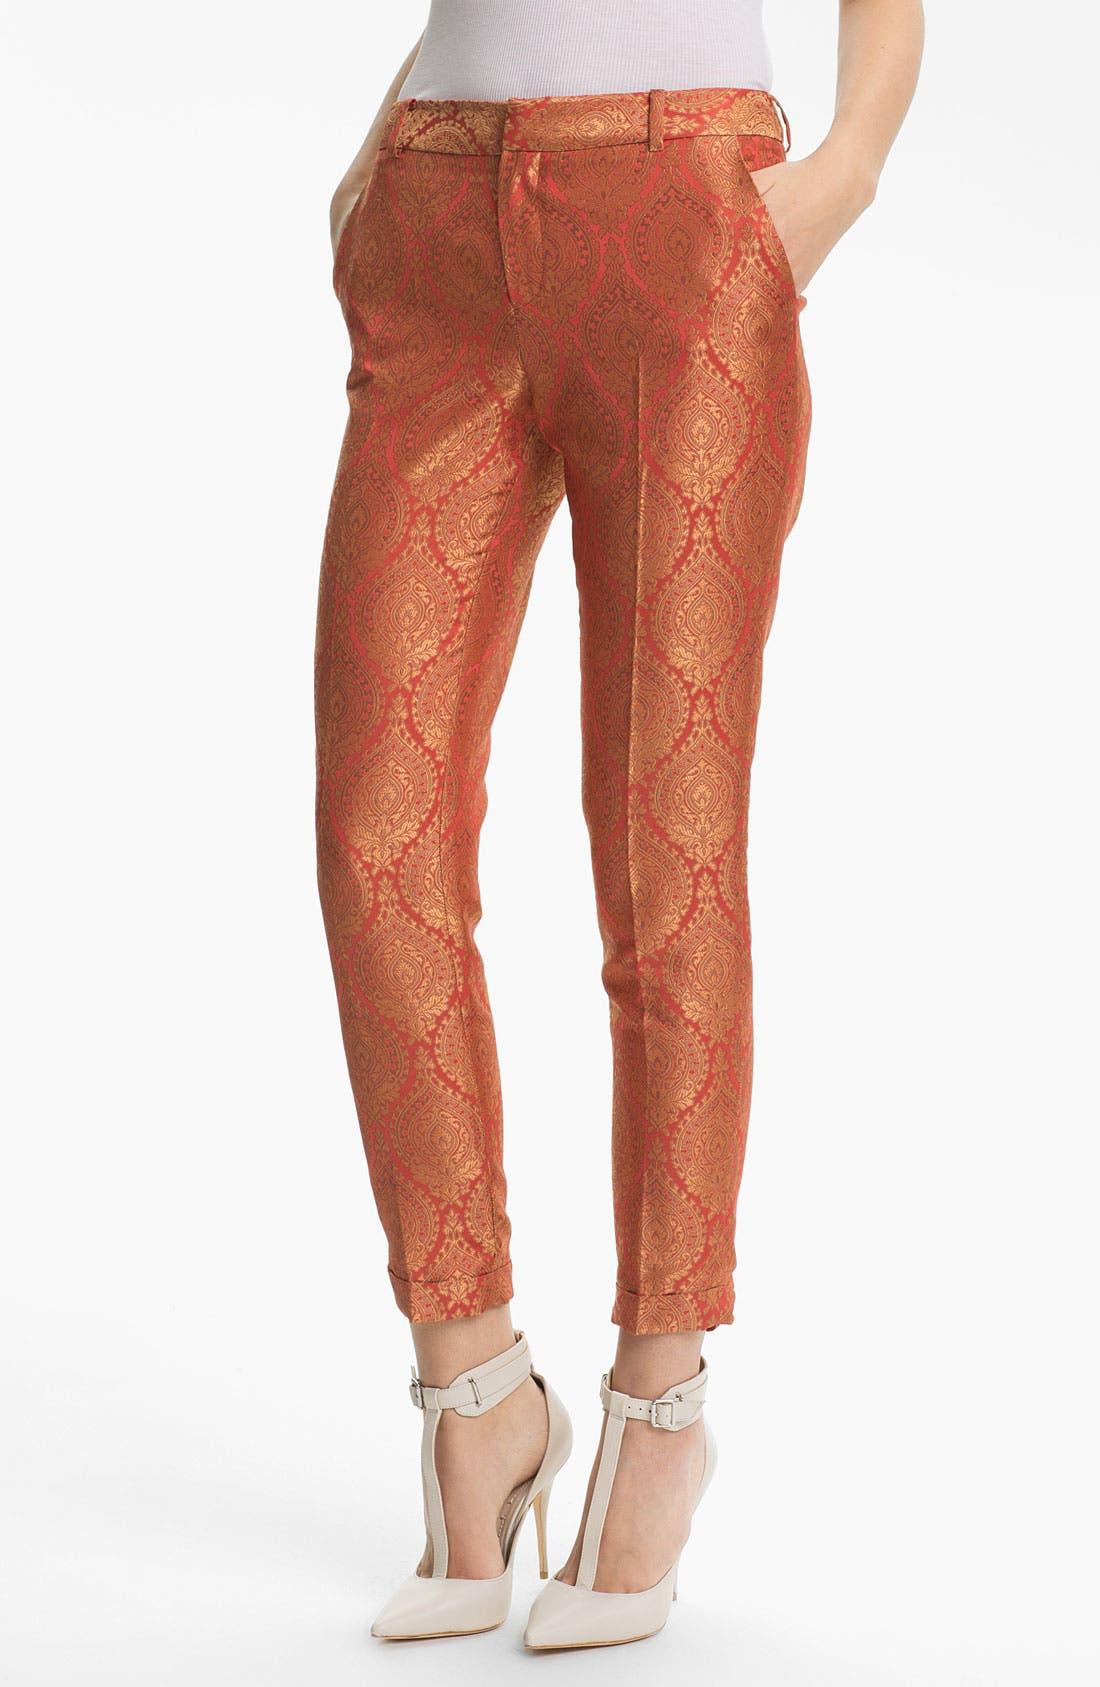 Main Image - Elizabeth and James 'Anselm' Metallic Jacquard Trousers